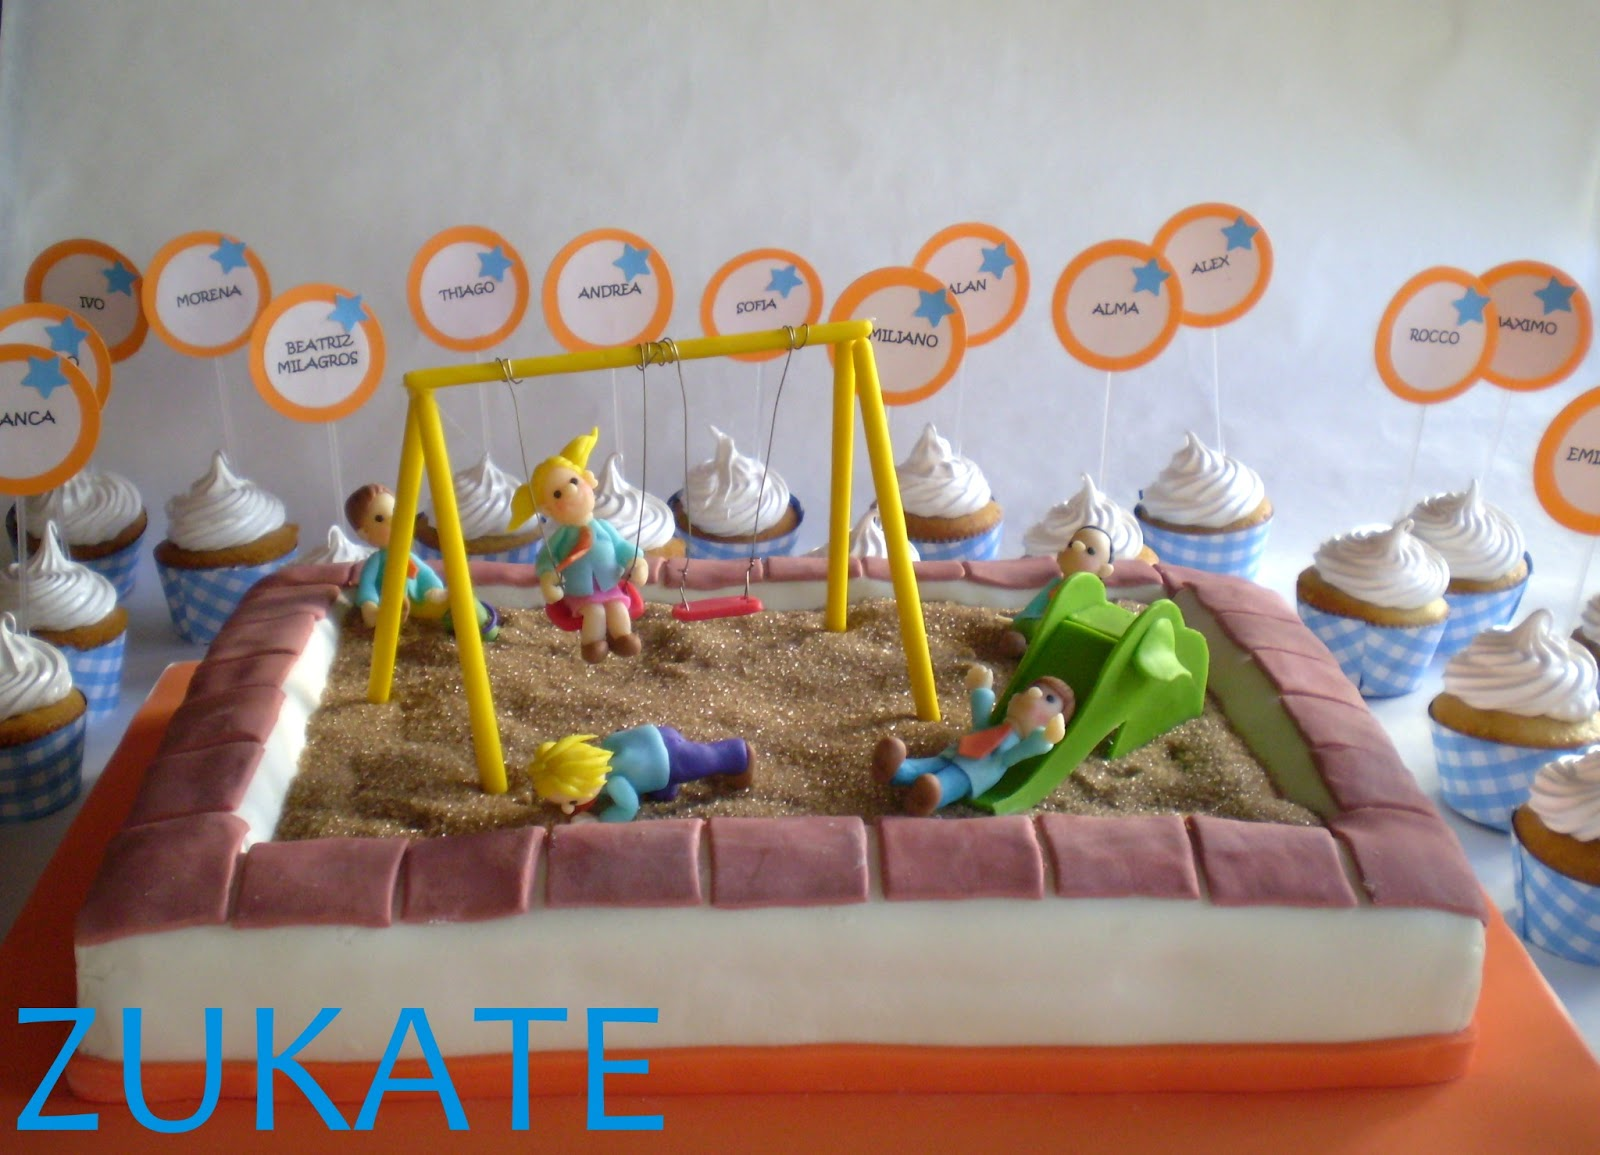 Torta egresaditos jardin de infantes zukate for Hamacas para el jardin